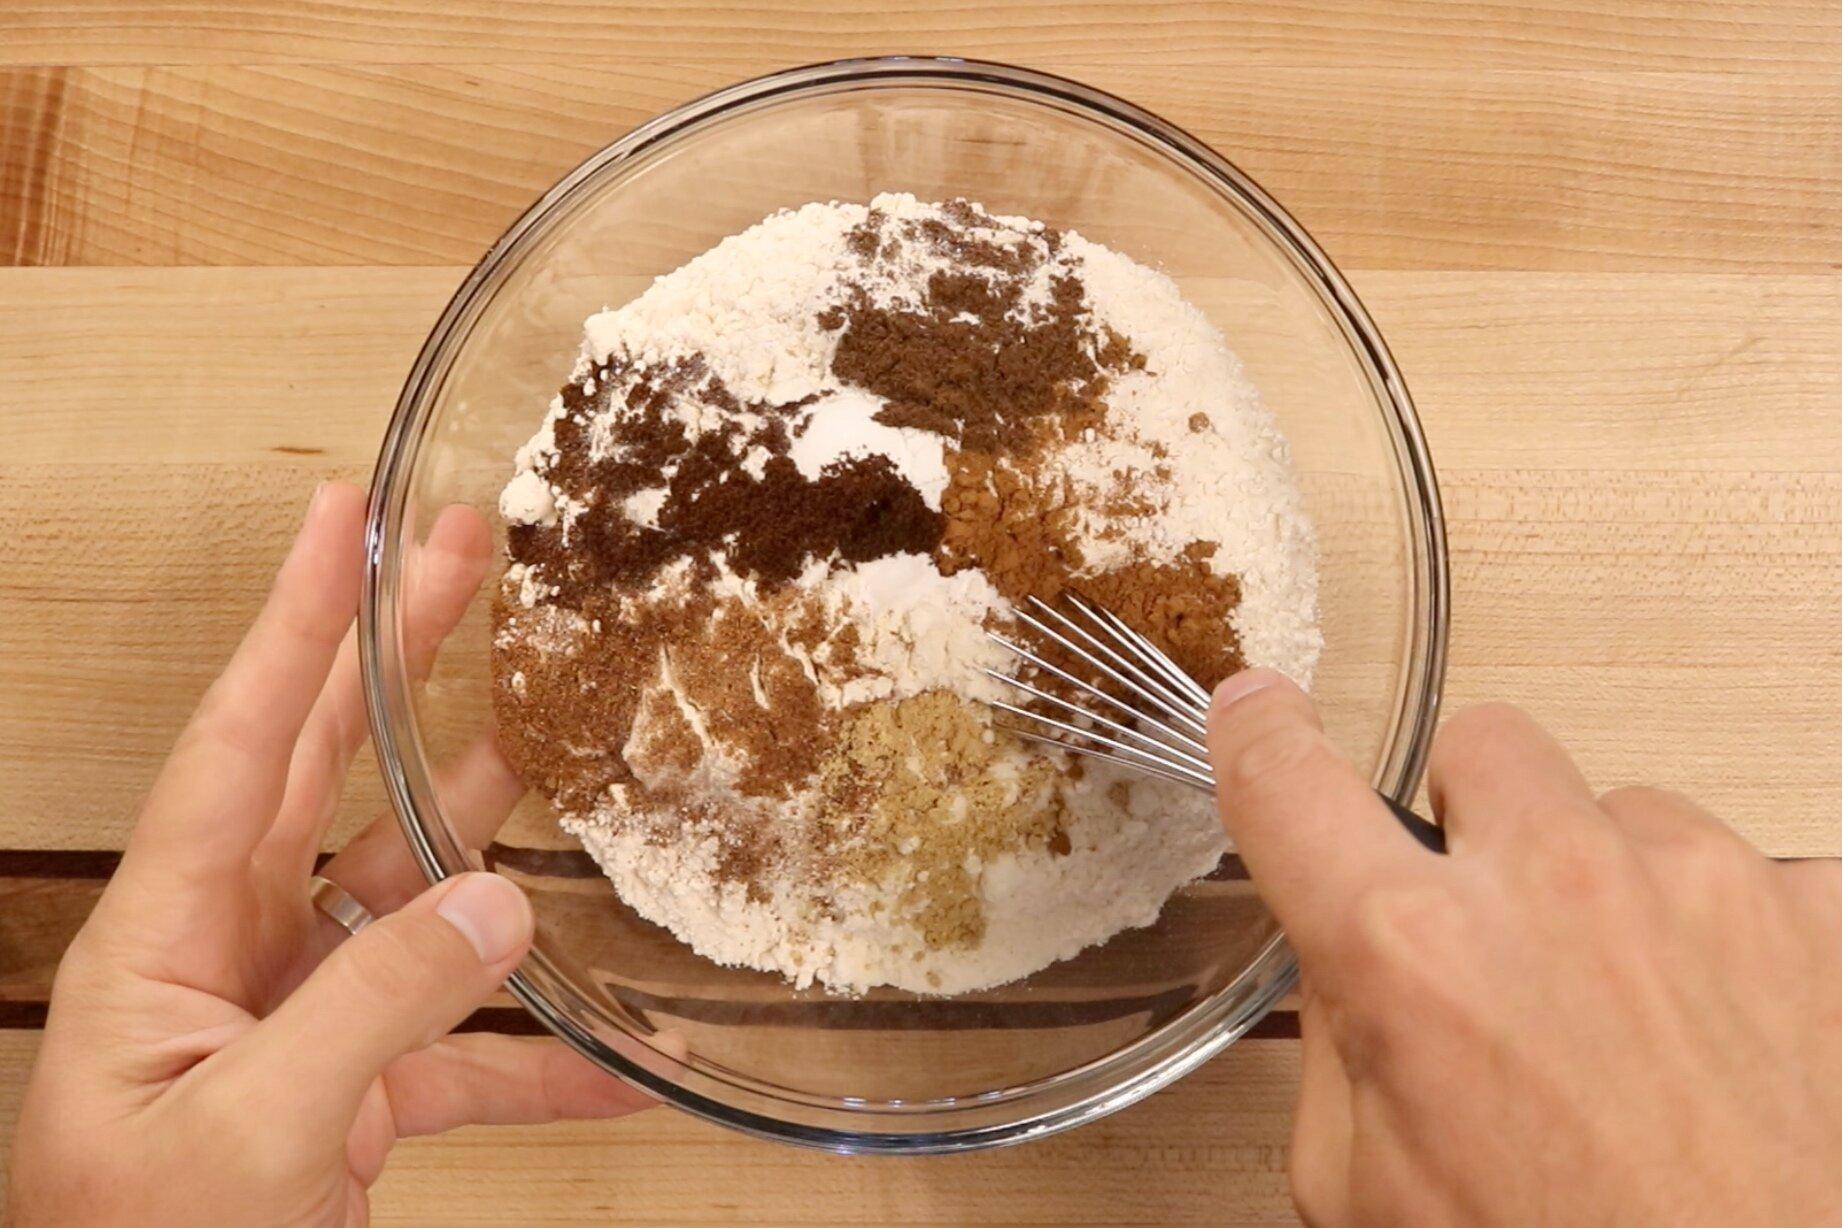 2. In a medium bowl add flour, baking powder, baking soda, salt, cinnamon, nutmeg, ginger, cloves and all-spice. Whisk until incorporated. Set aside. -